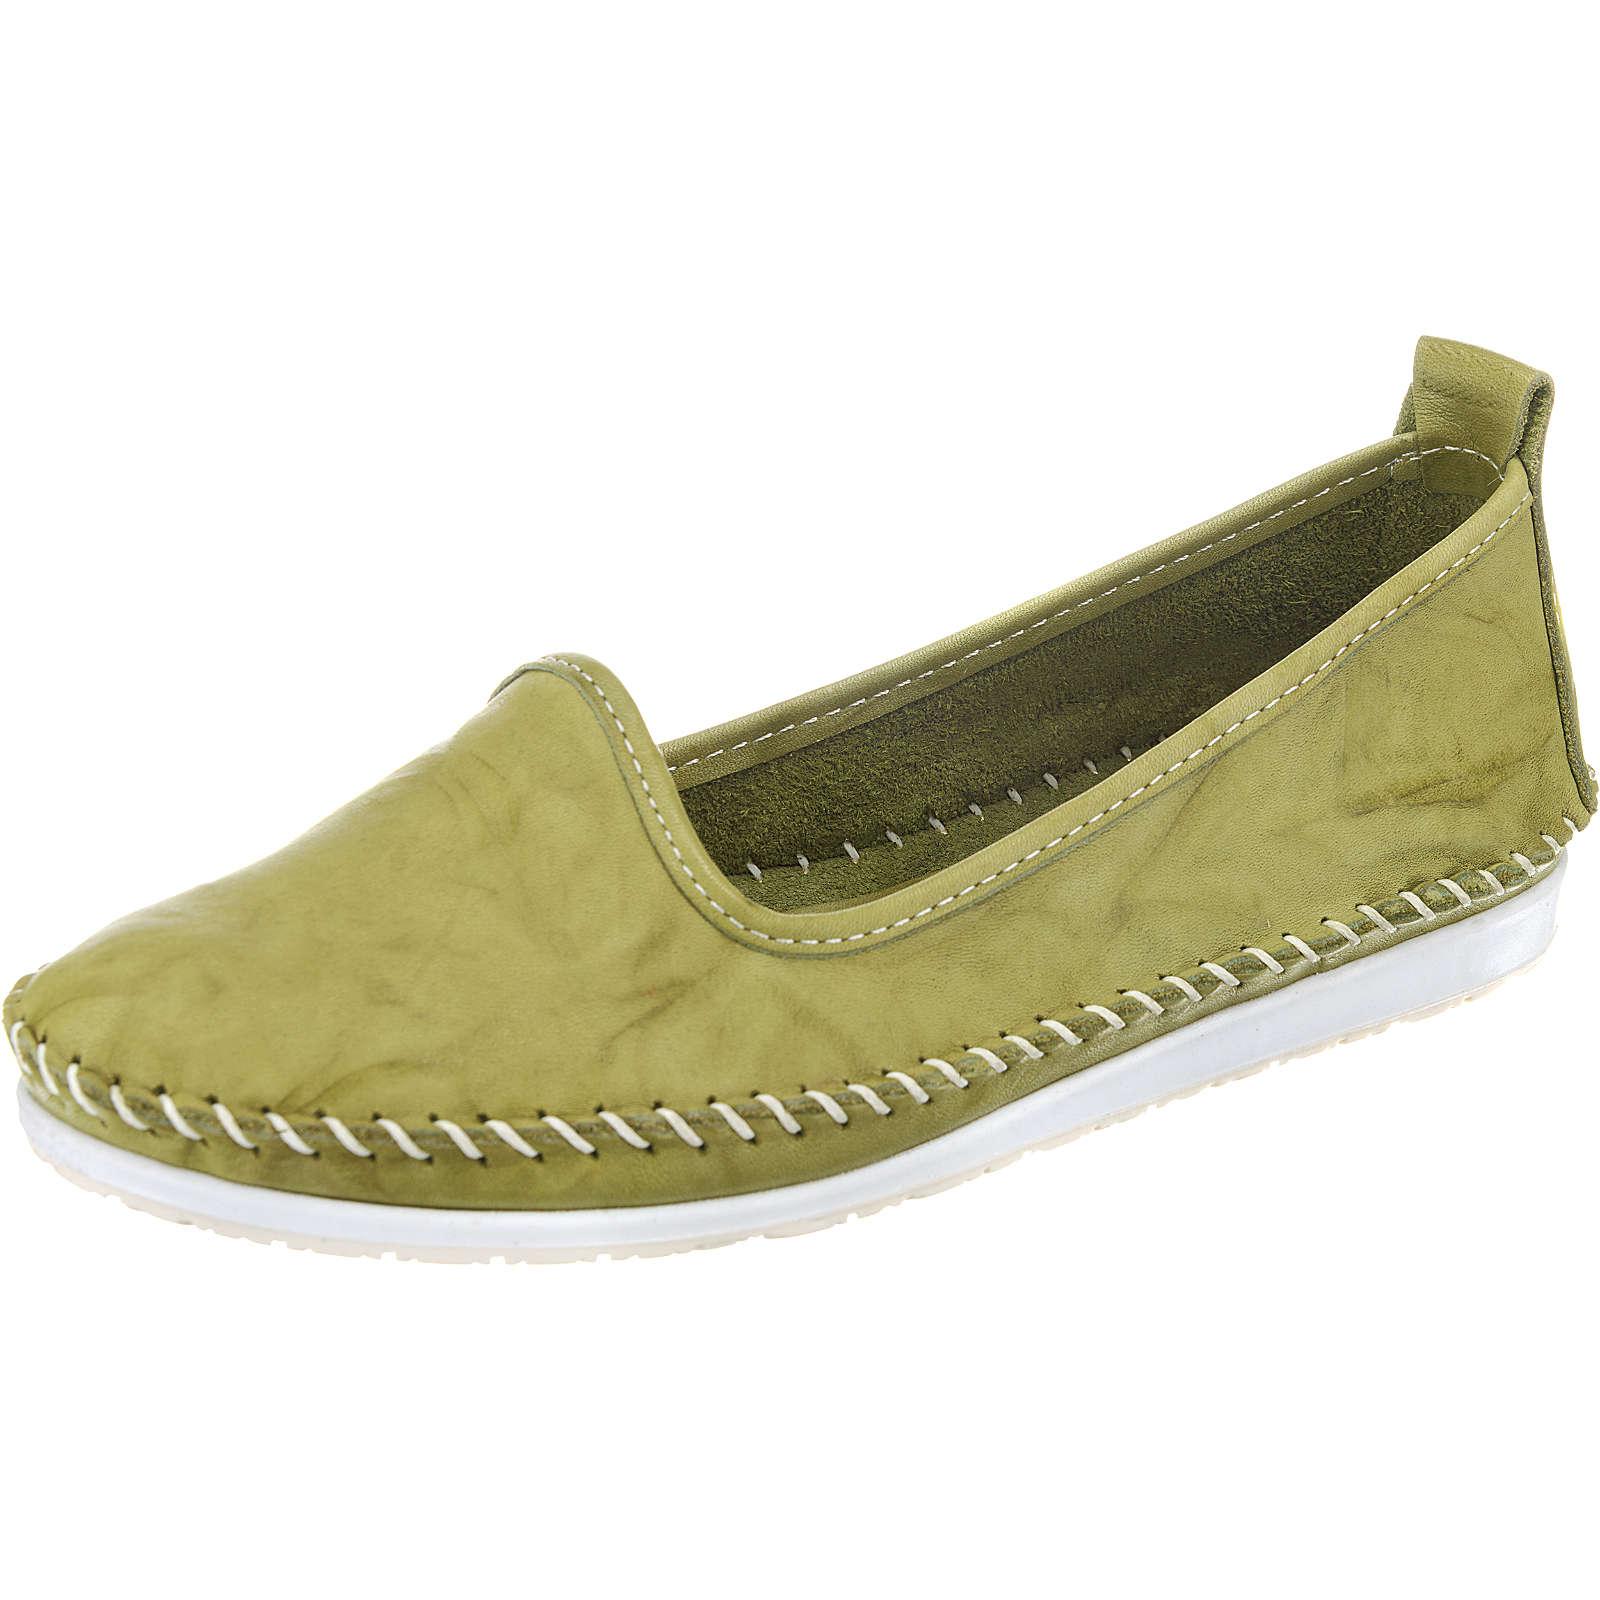 Andrea Conti Komfort-Slipper grün Damen Gr. 37